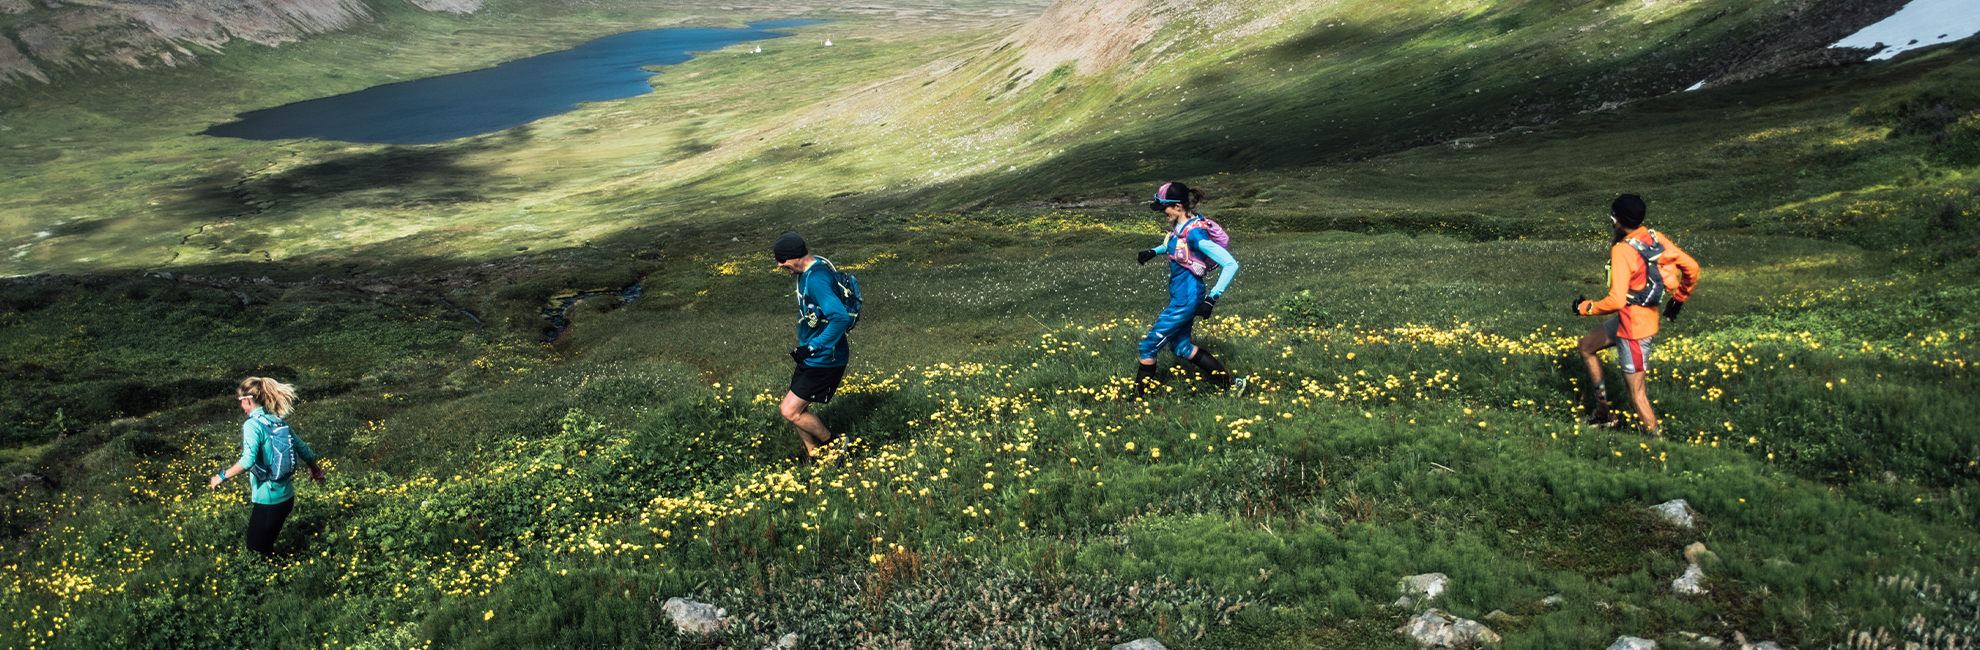 Yahnnybly-kelvintrautman-iceland-westiceland-hornstradir-naturereserve-fjords-trailrunning-adventure